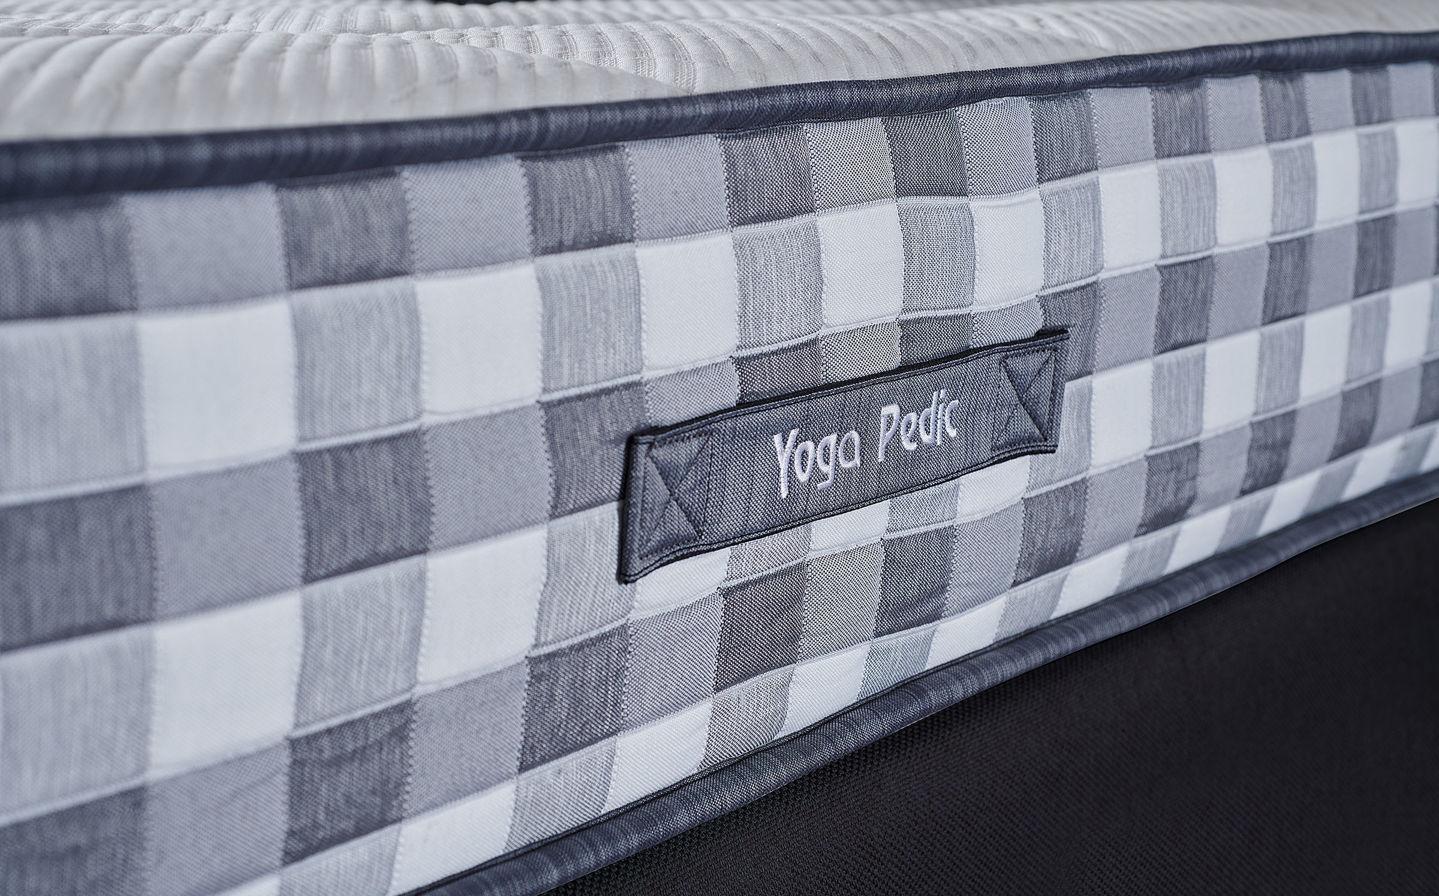 Yoga Pedic Yatak 120 X 200